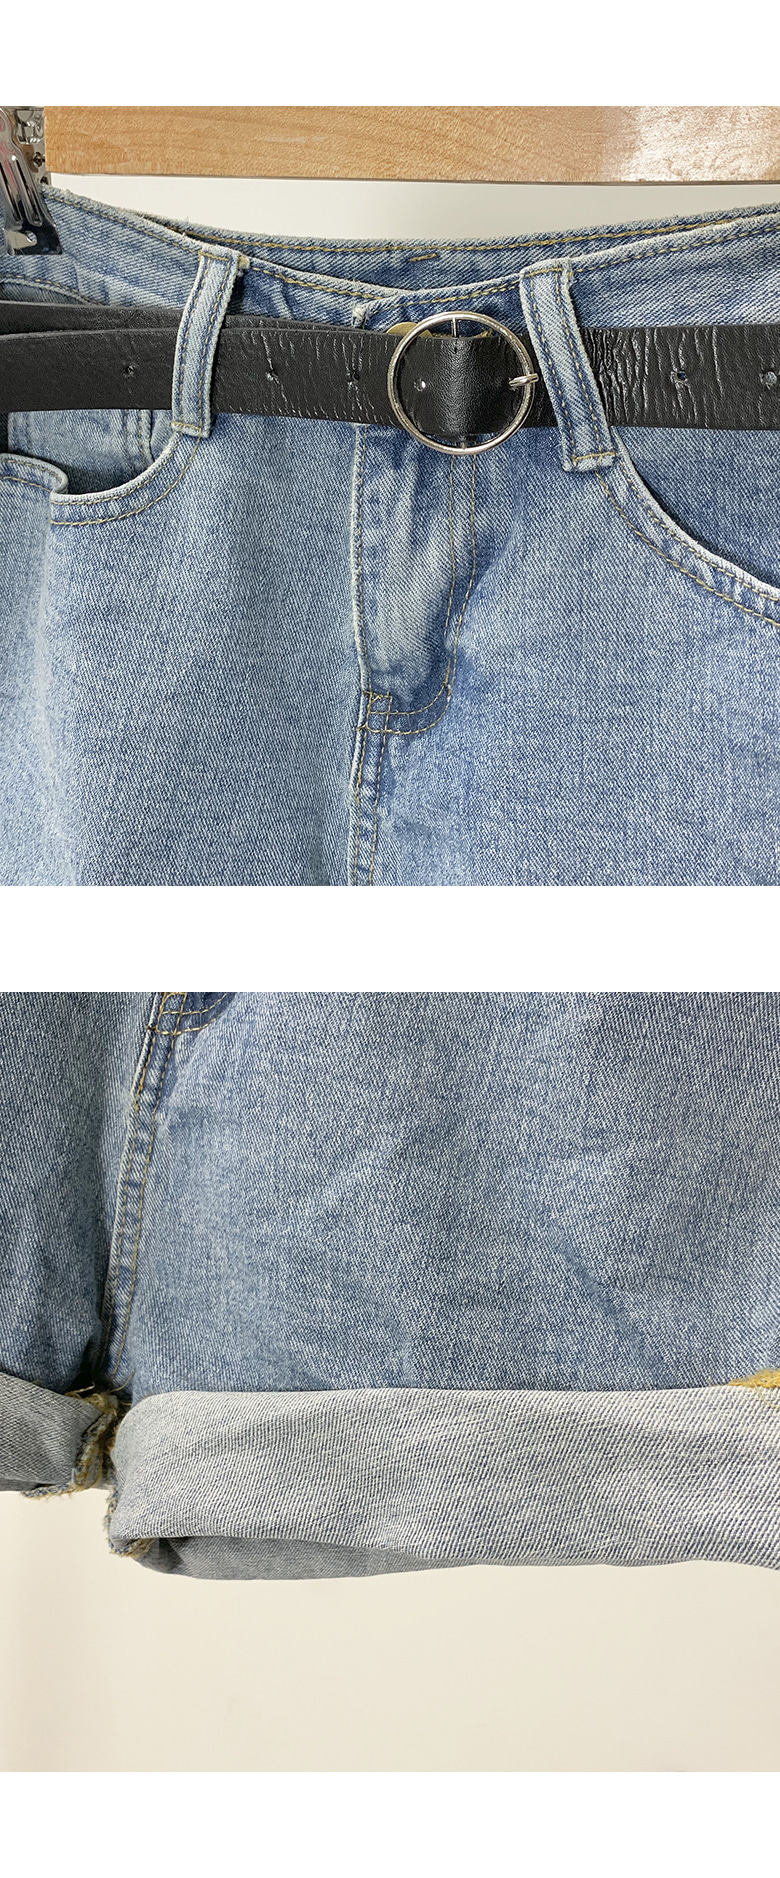 Belt set denim short pants